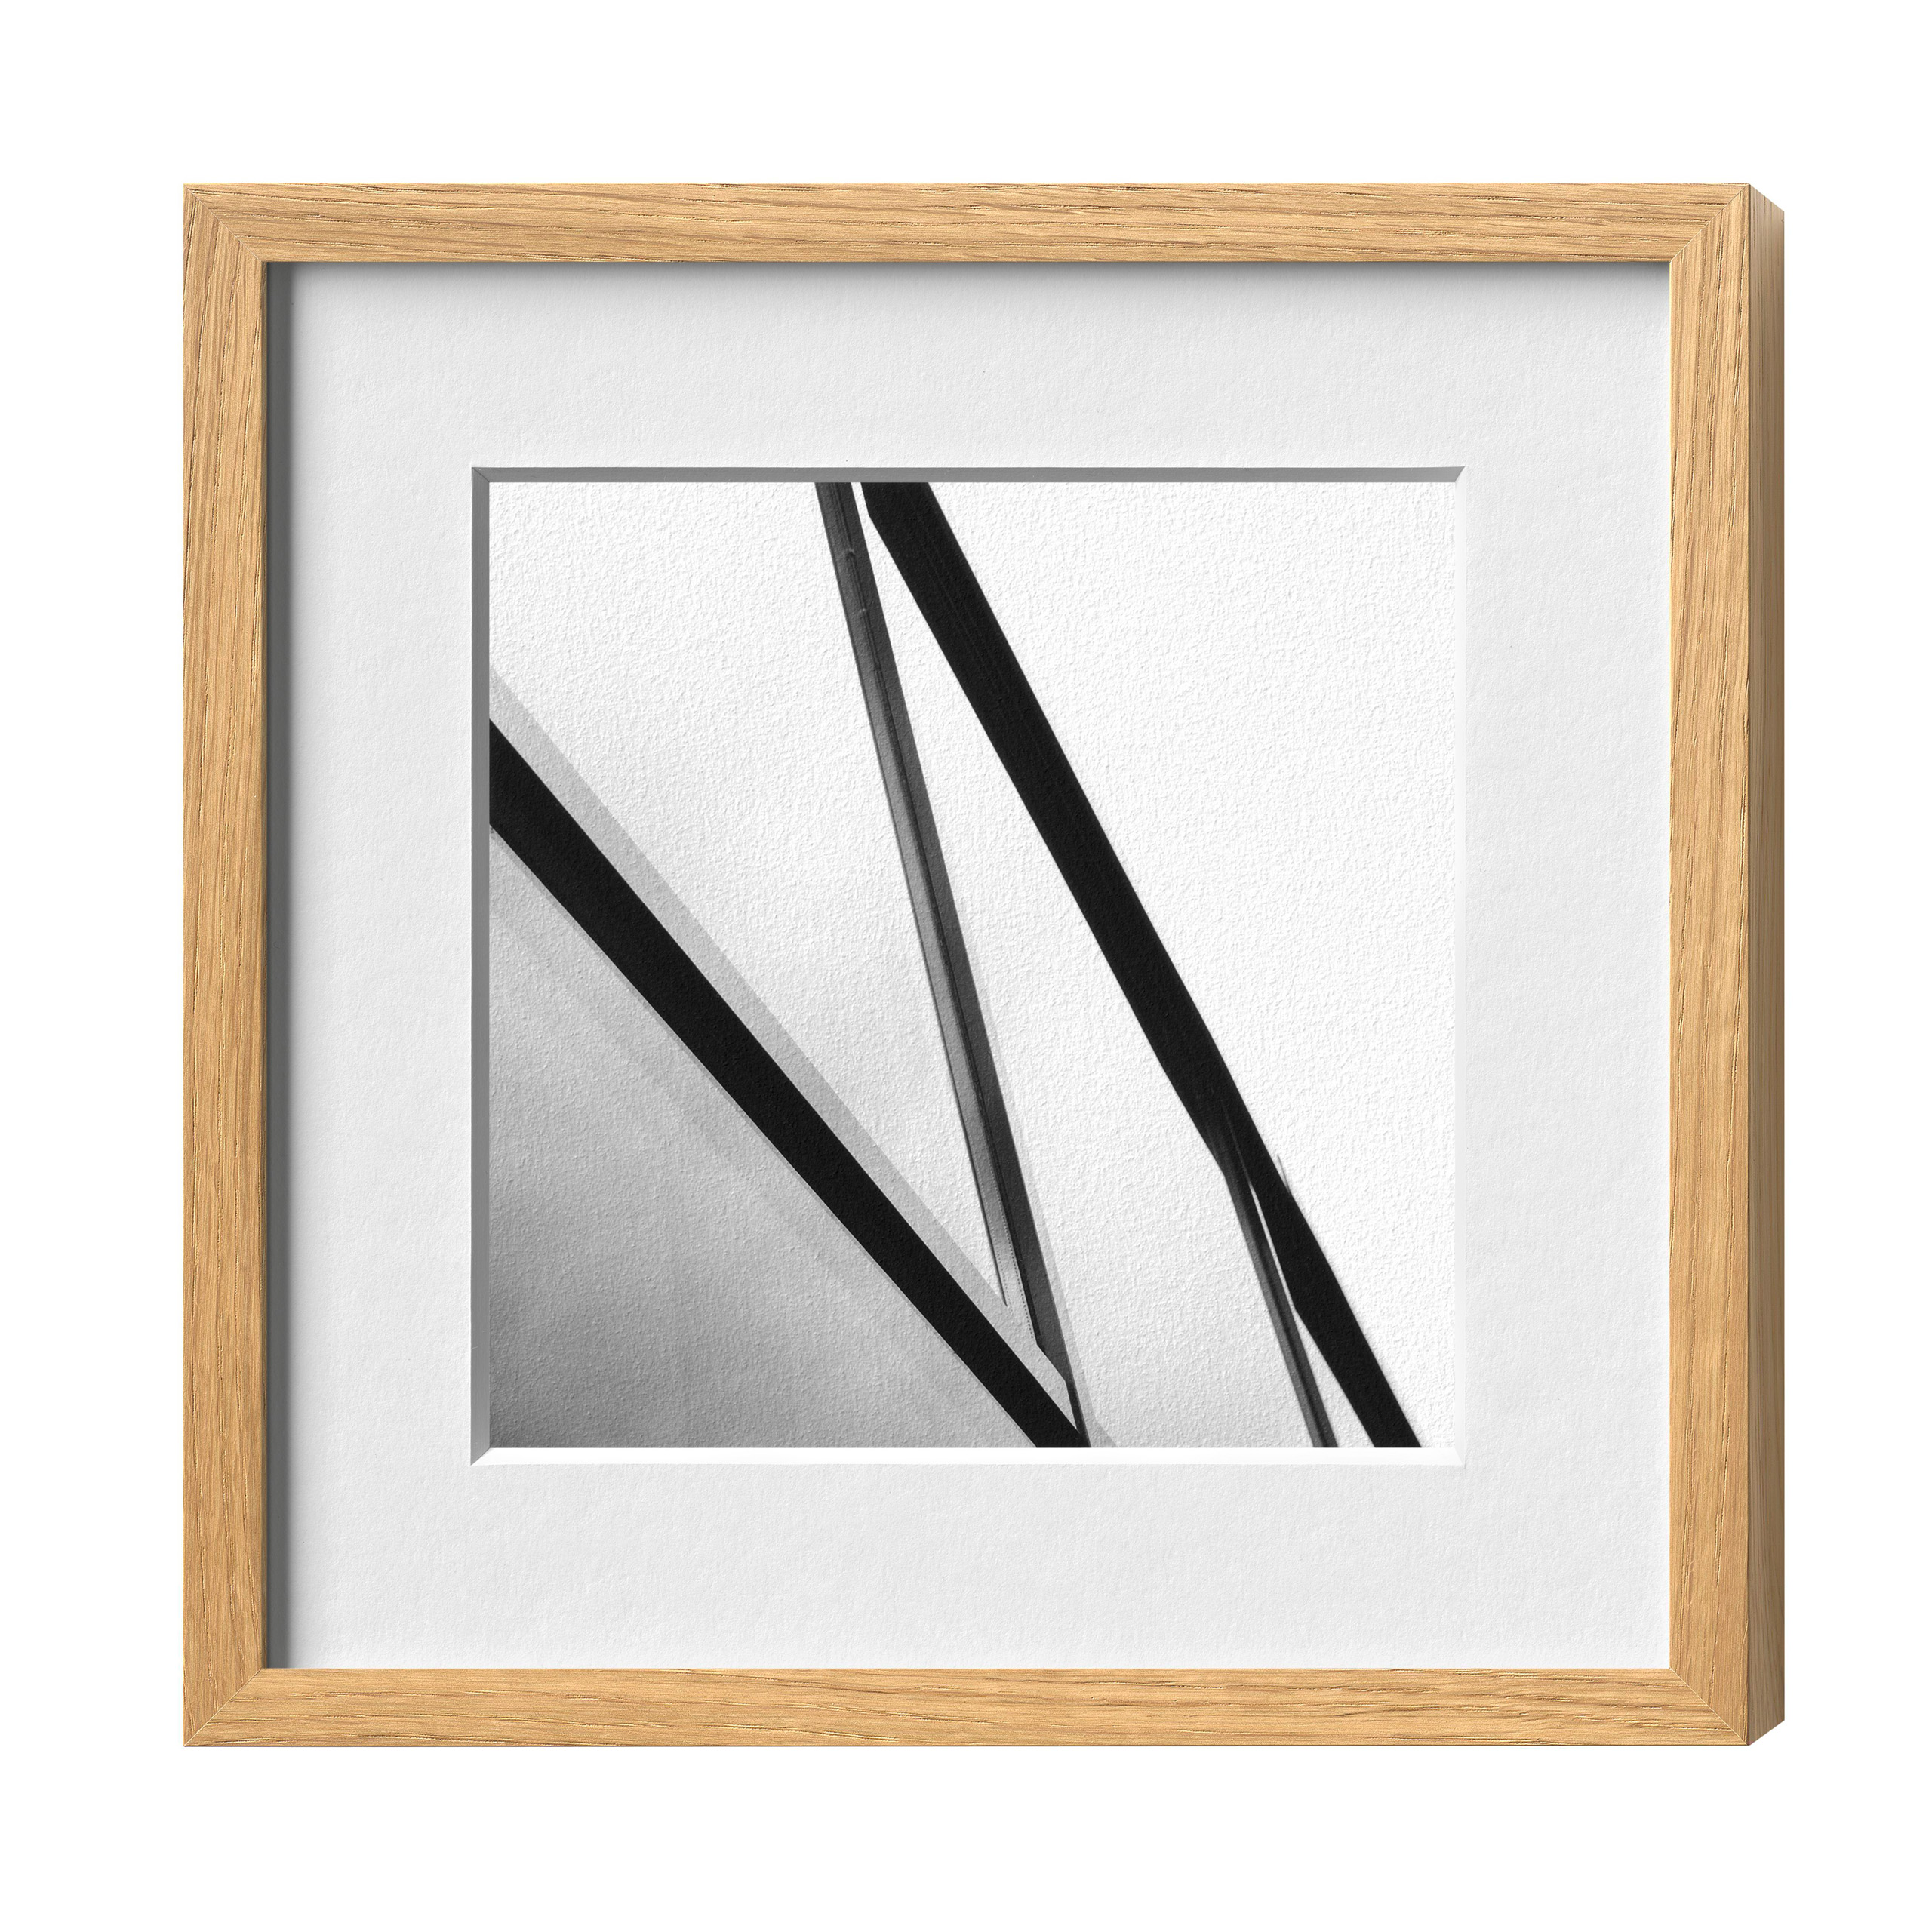 halbe classic magnetrahmen online kaufen. Black Bedroom Furniture Sets. Home Design Ideas